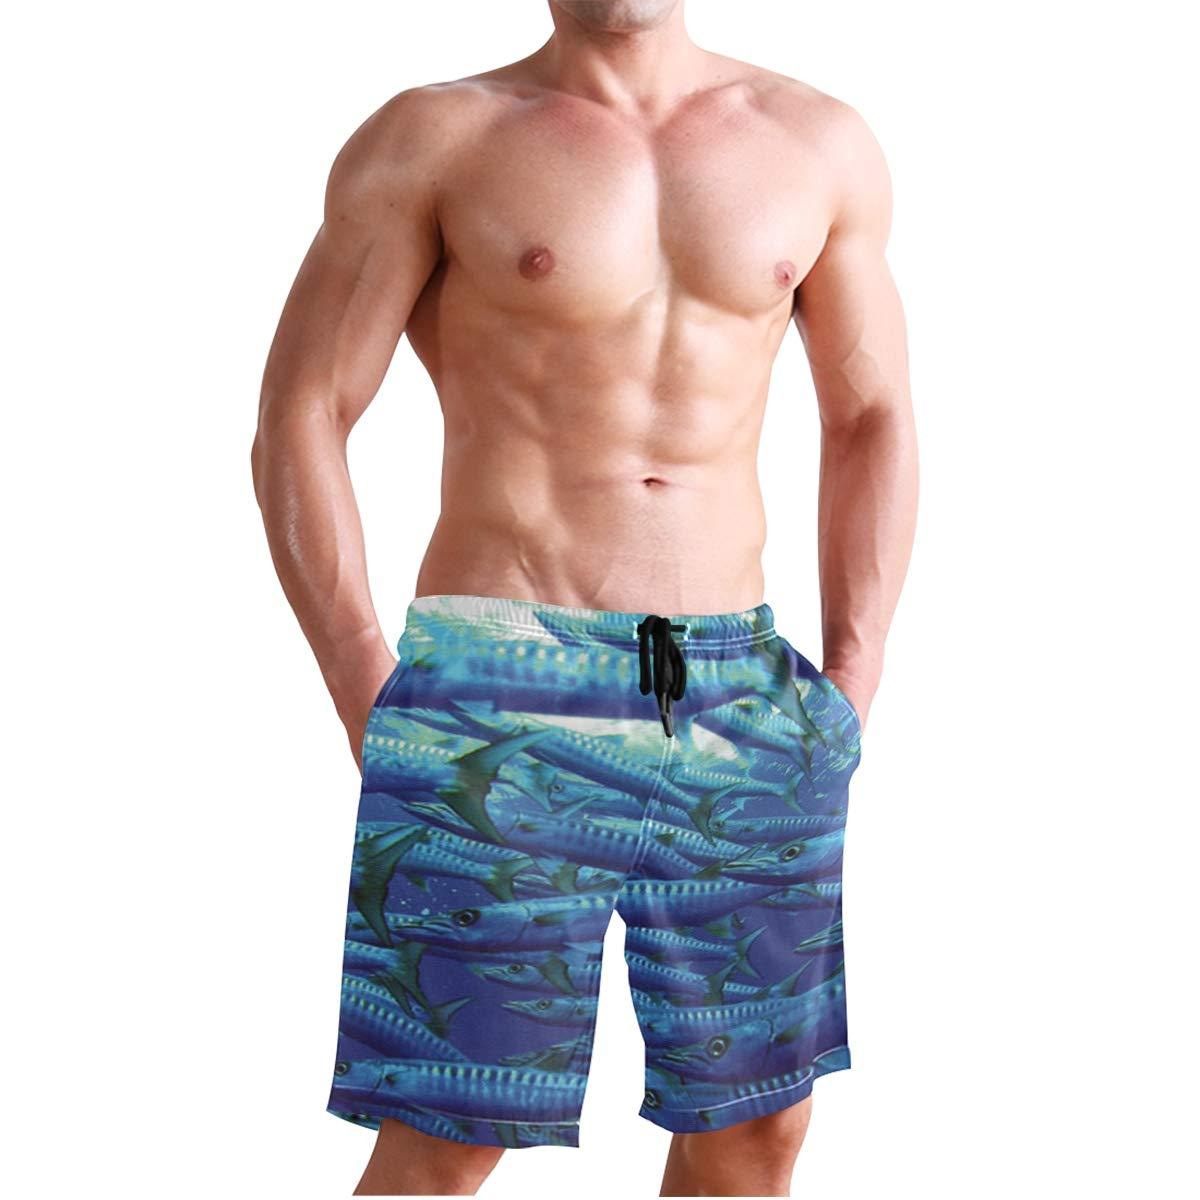 Barracuda Australia Mens Swim Trunks 3D Printed Beach Board Shorts with Pockets for Teen Boys